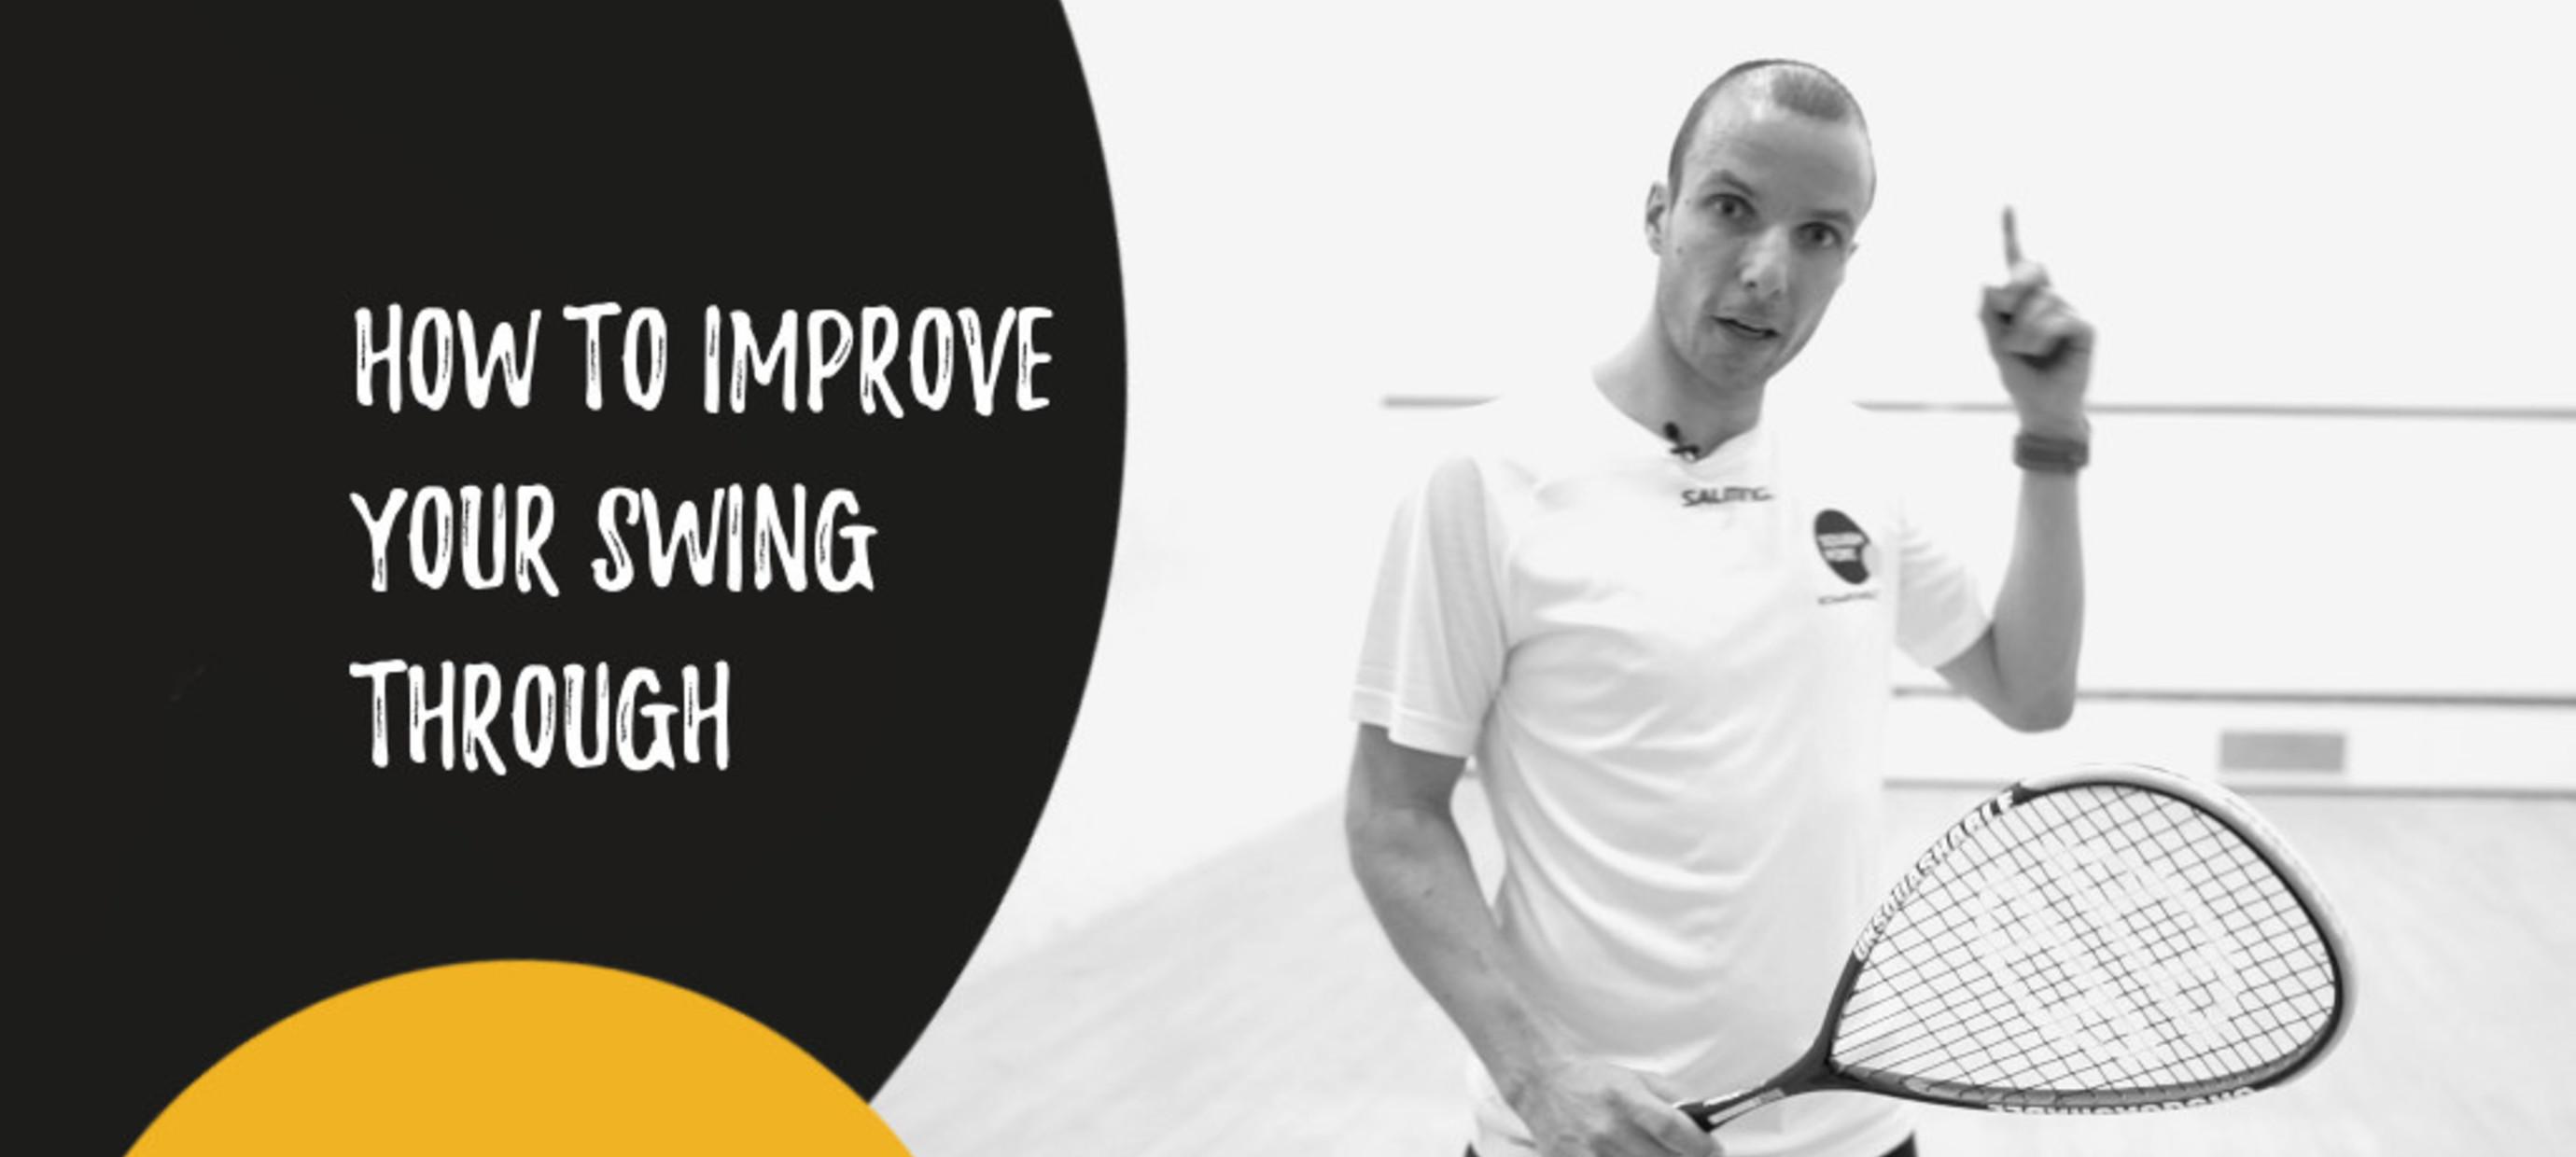 Improve your swing through